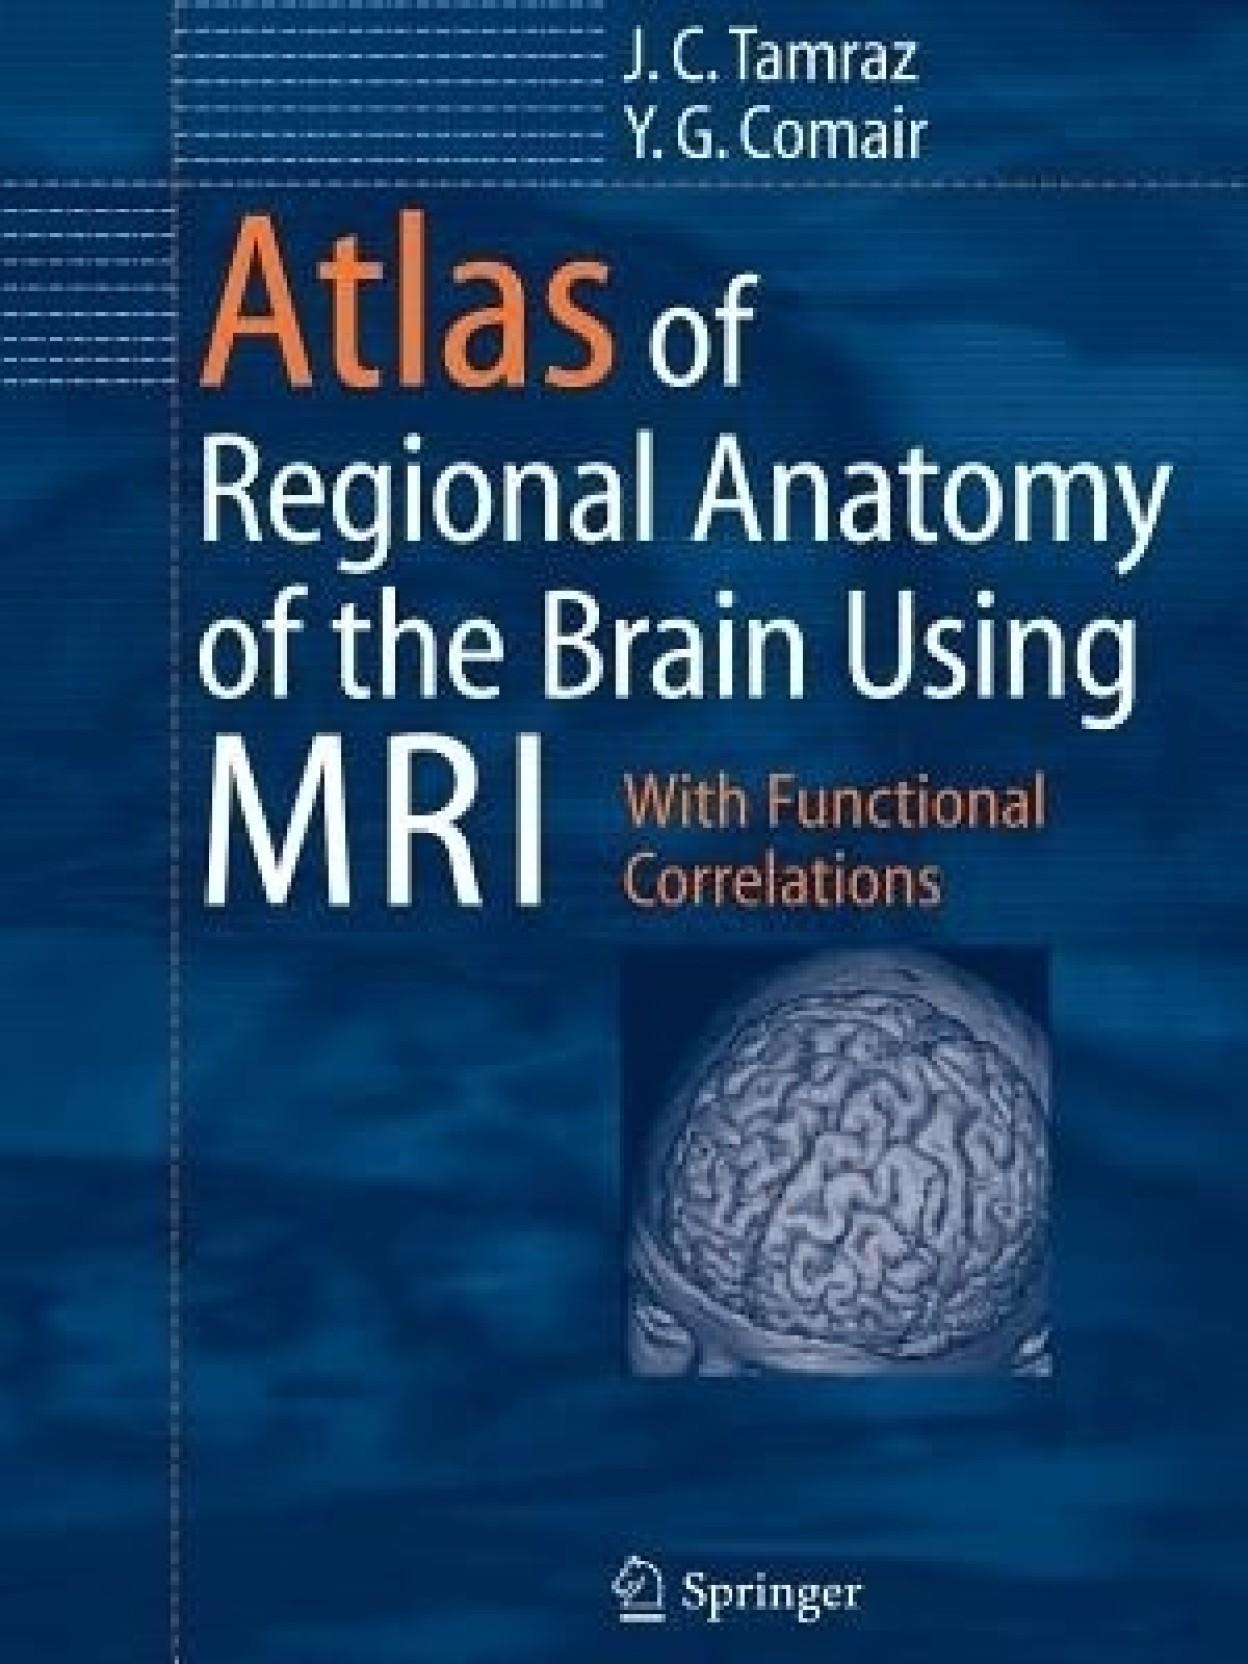 Atlas Of Regional Anatomy Of The Brain Using Mri Buy Atlas Of